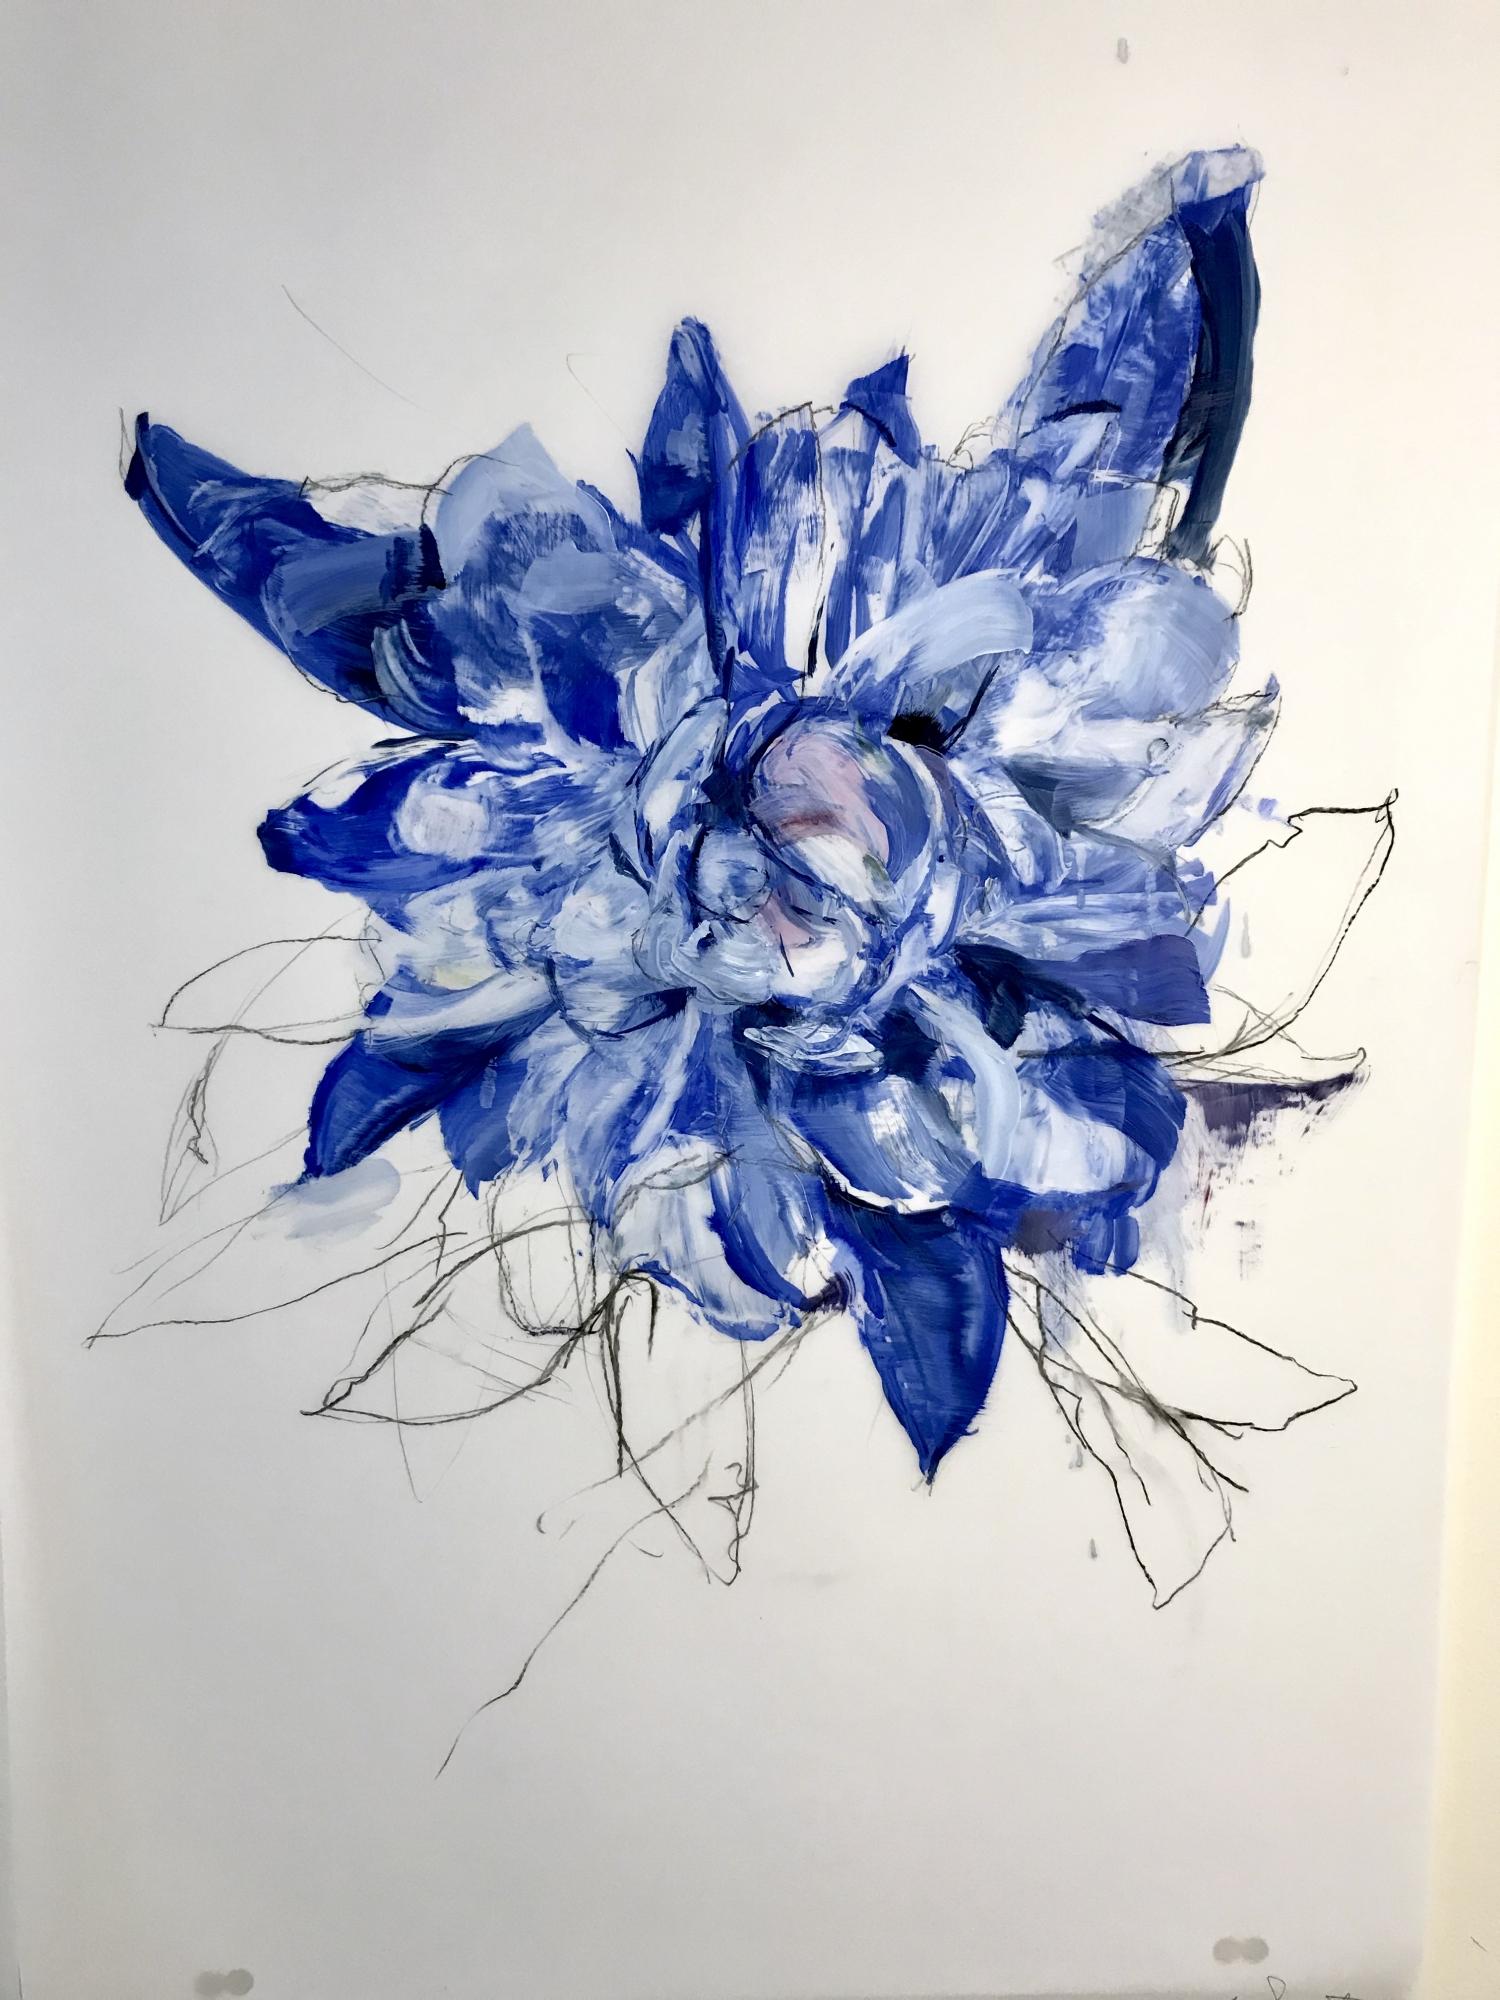 Deep Blue Peony 3 by Madeleine Lamont